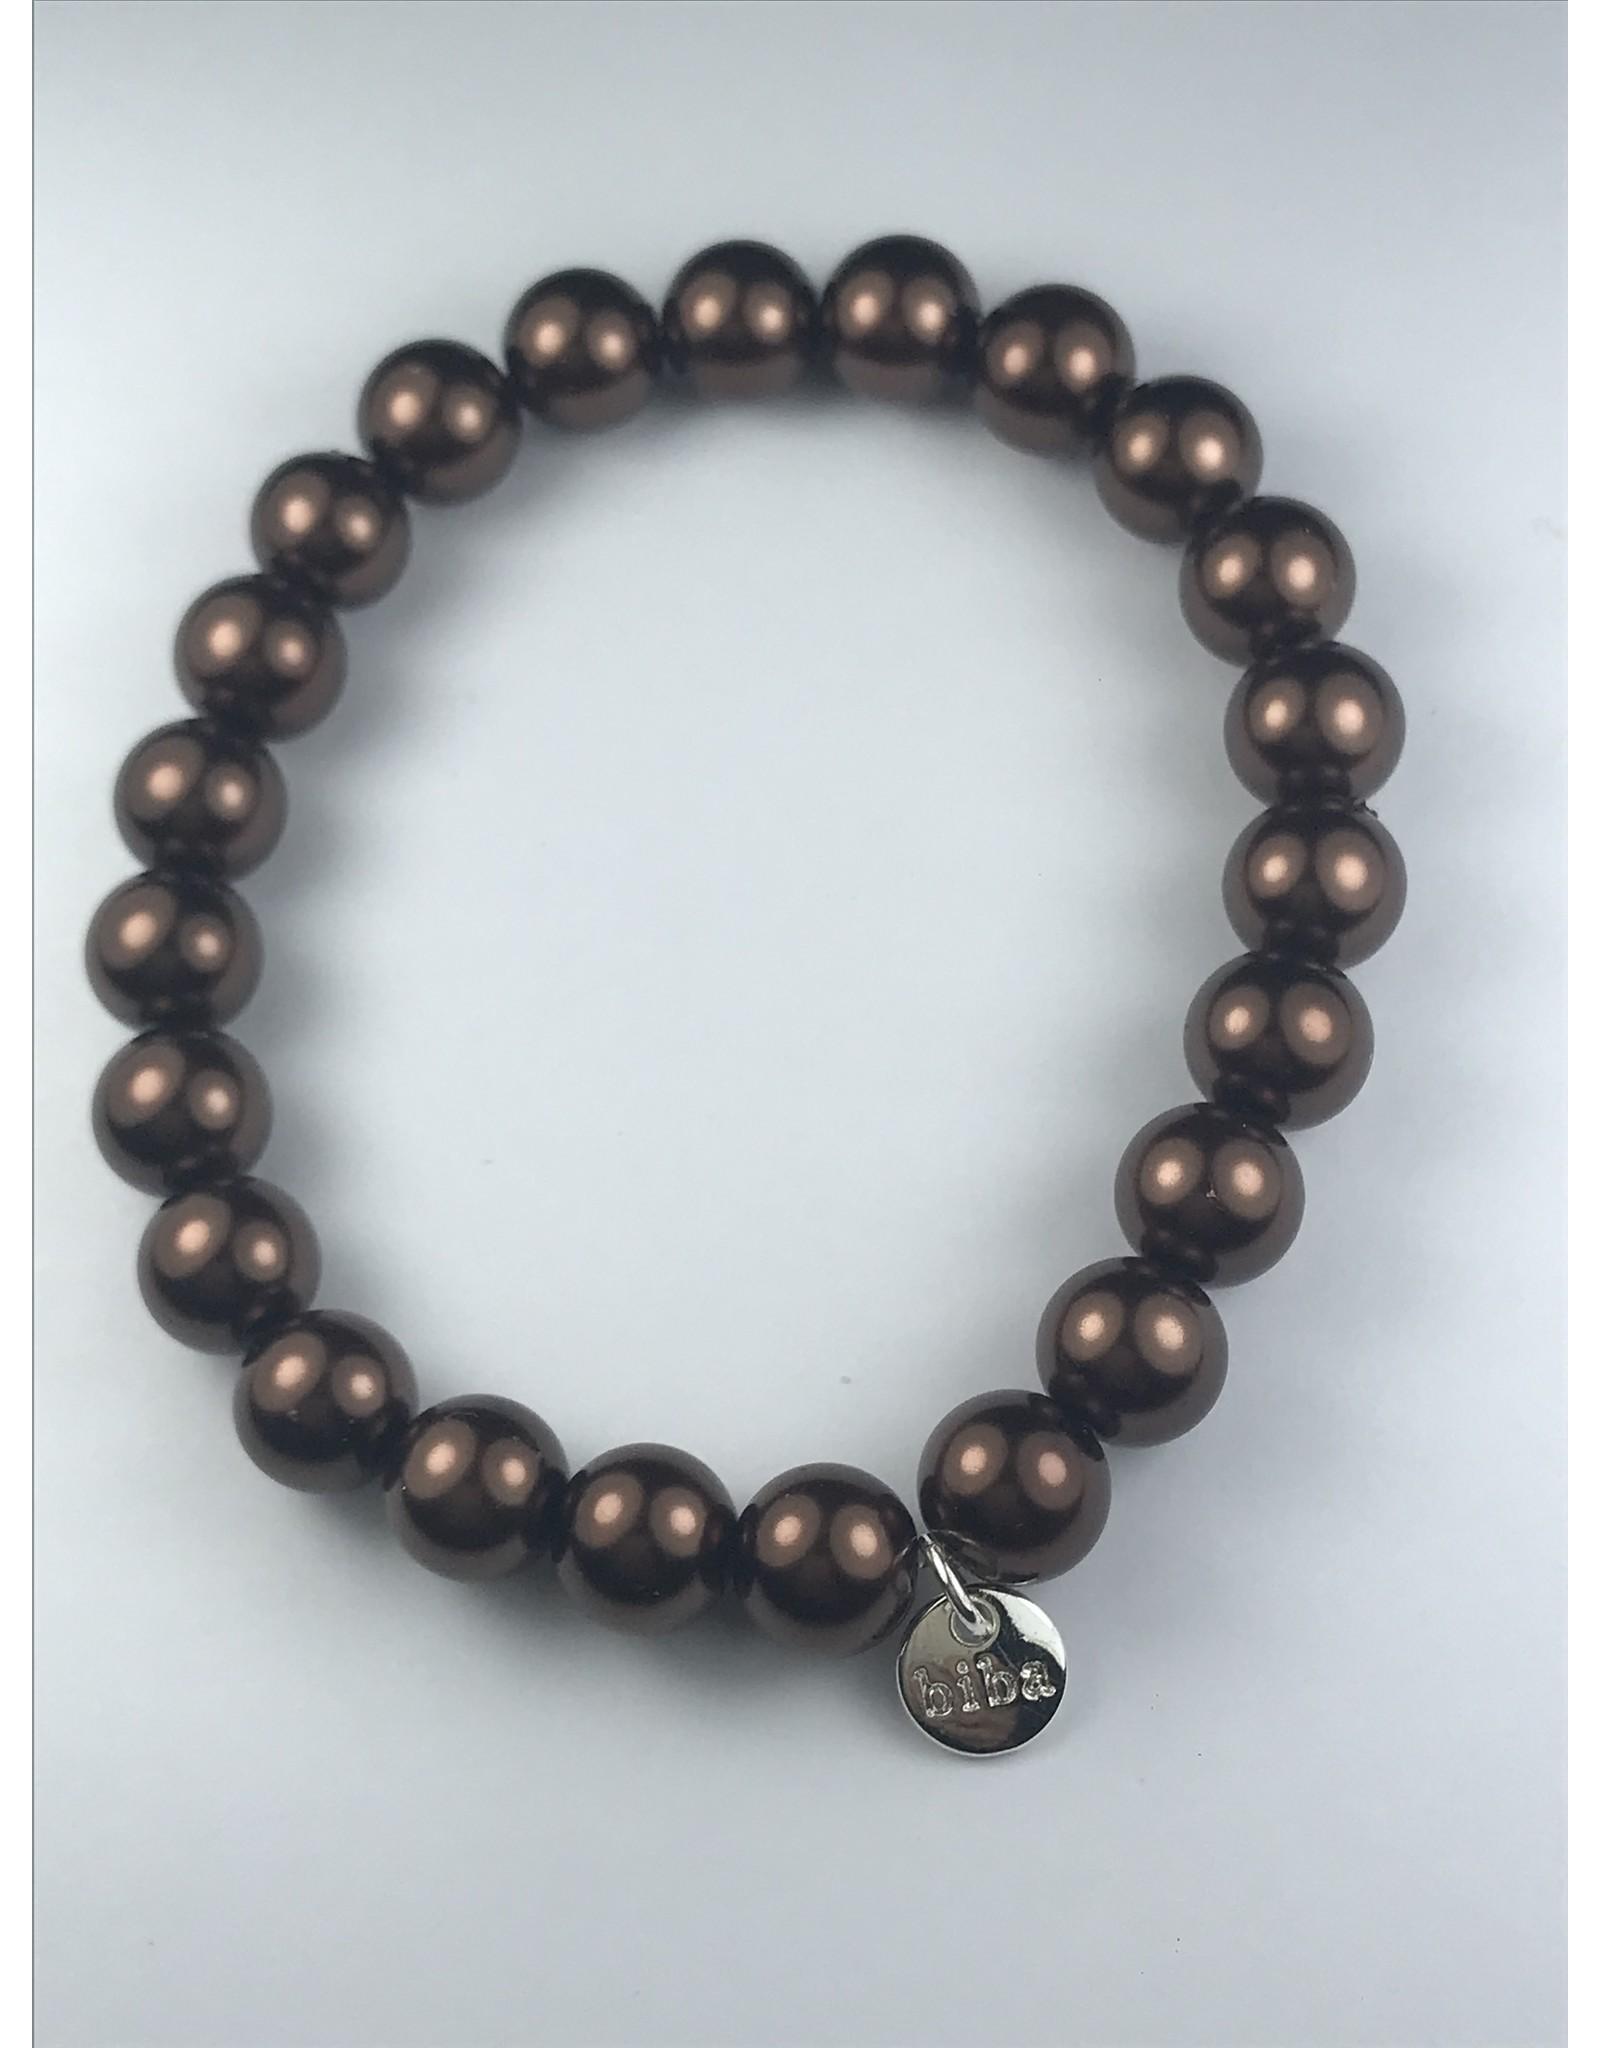 Biba armband - bronskleurige bollen - grof